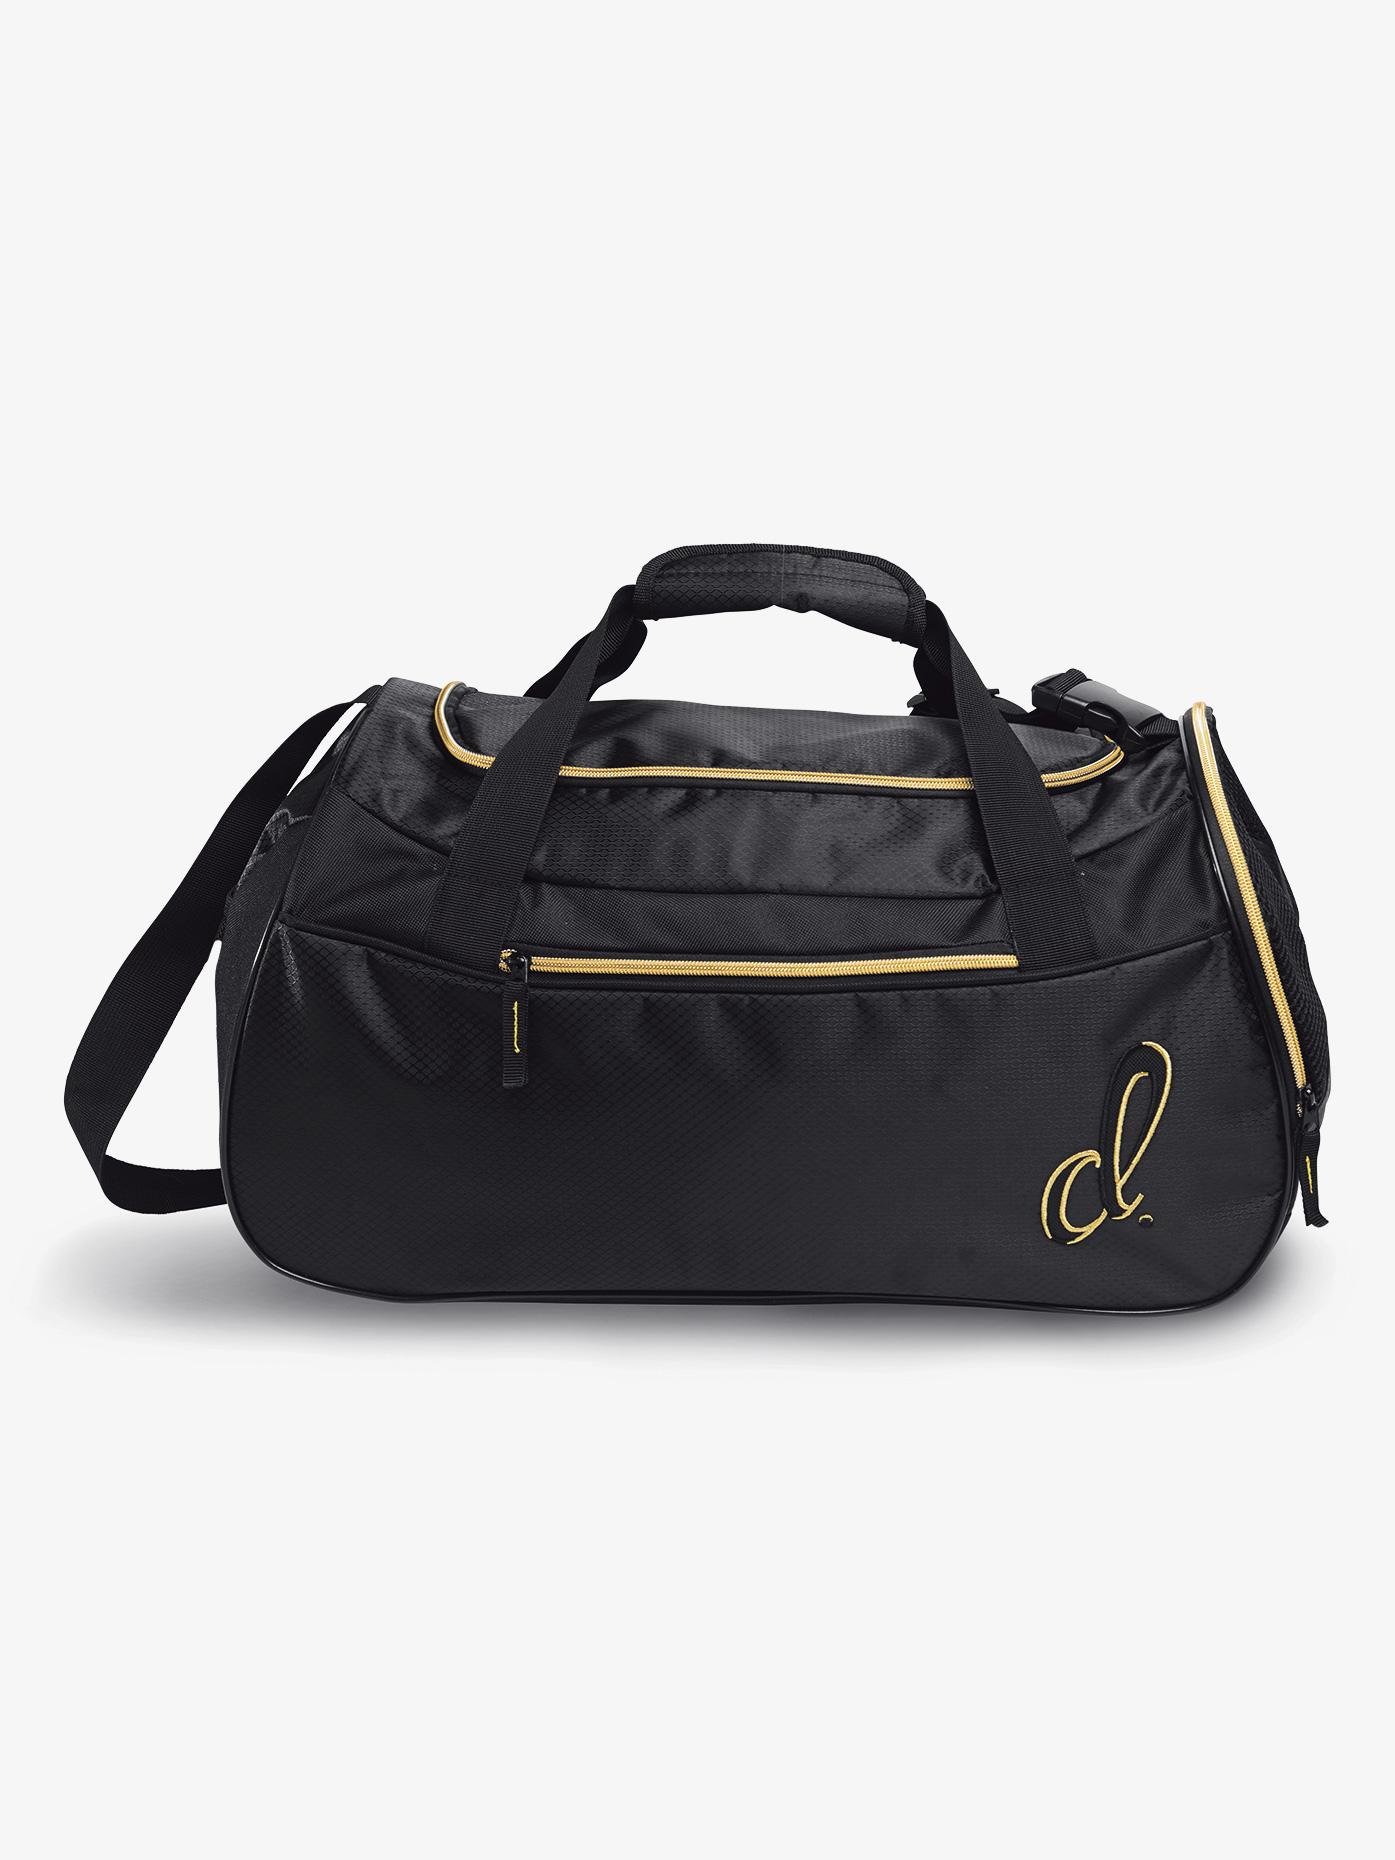 DansBagz L.O.R. Duffle Bag B593